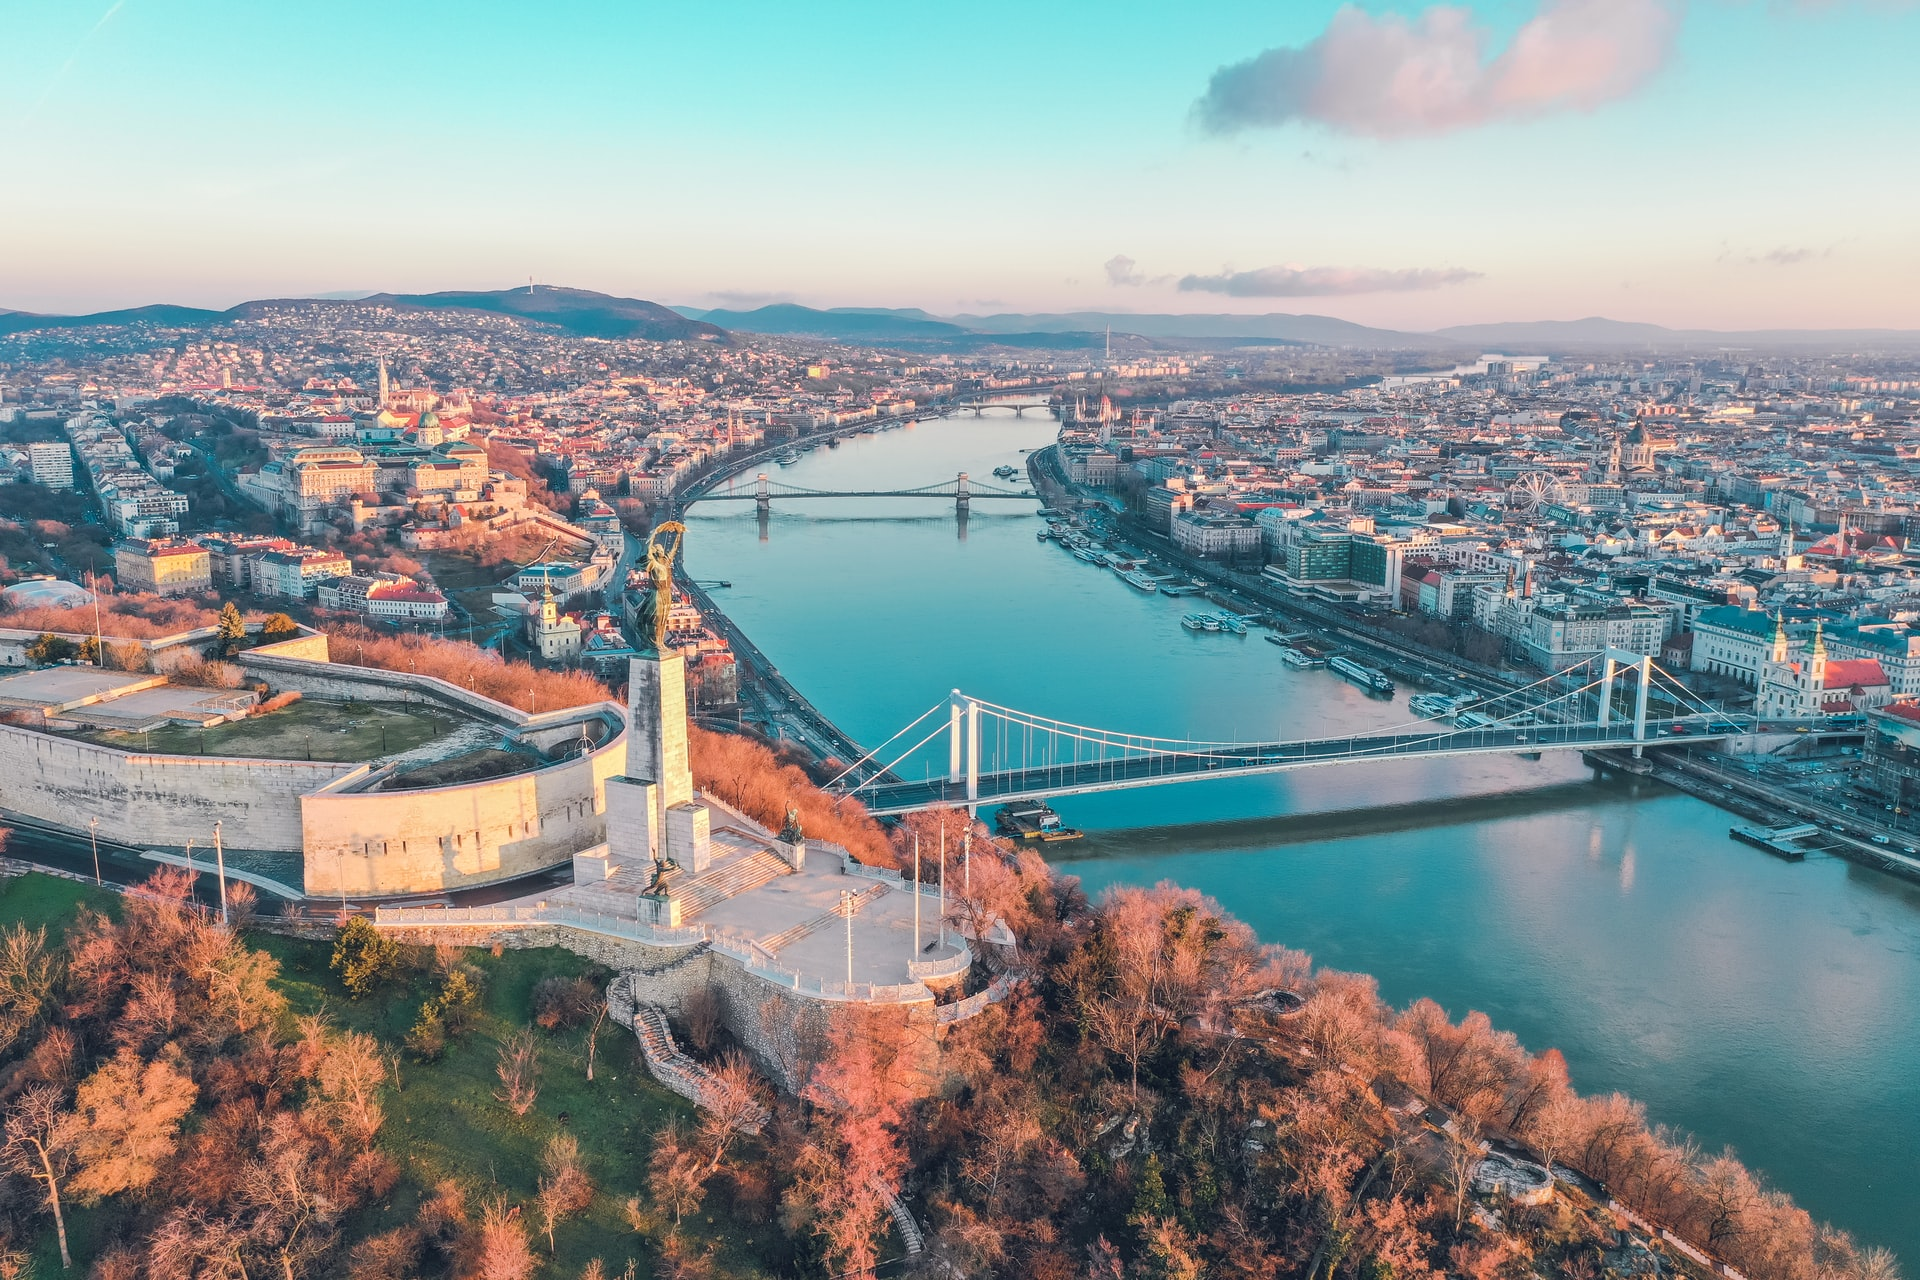 Danube River, Budapest (photo: Bence Balla-Schottner)